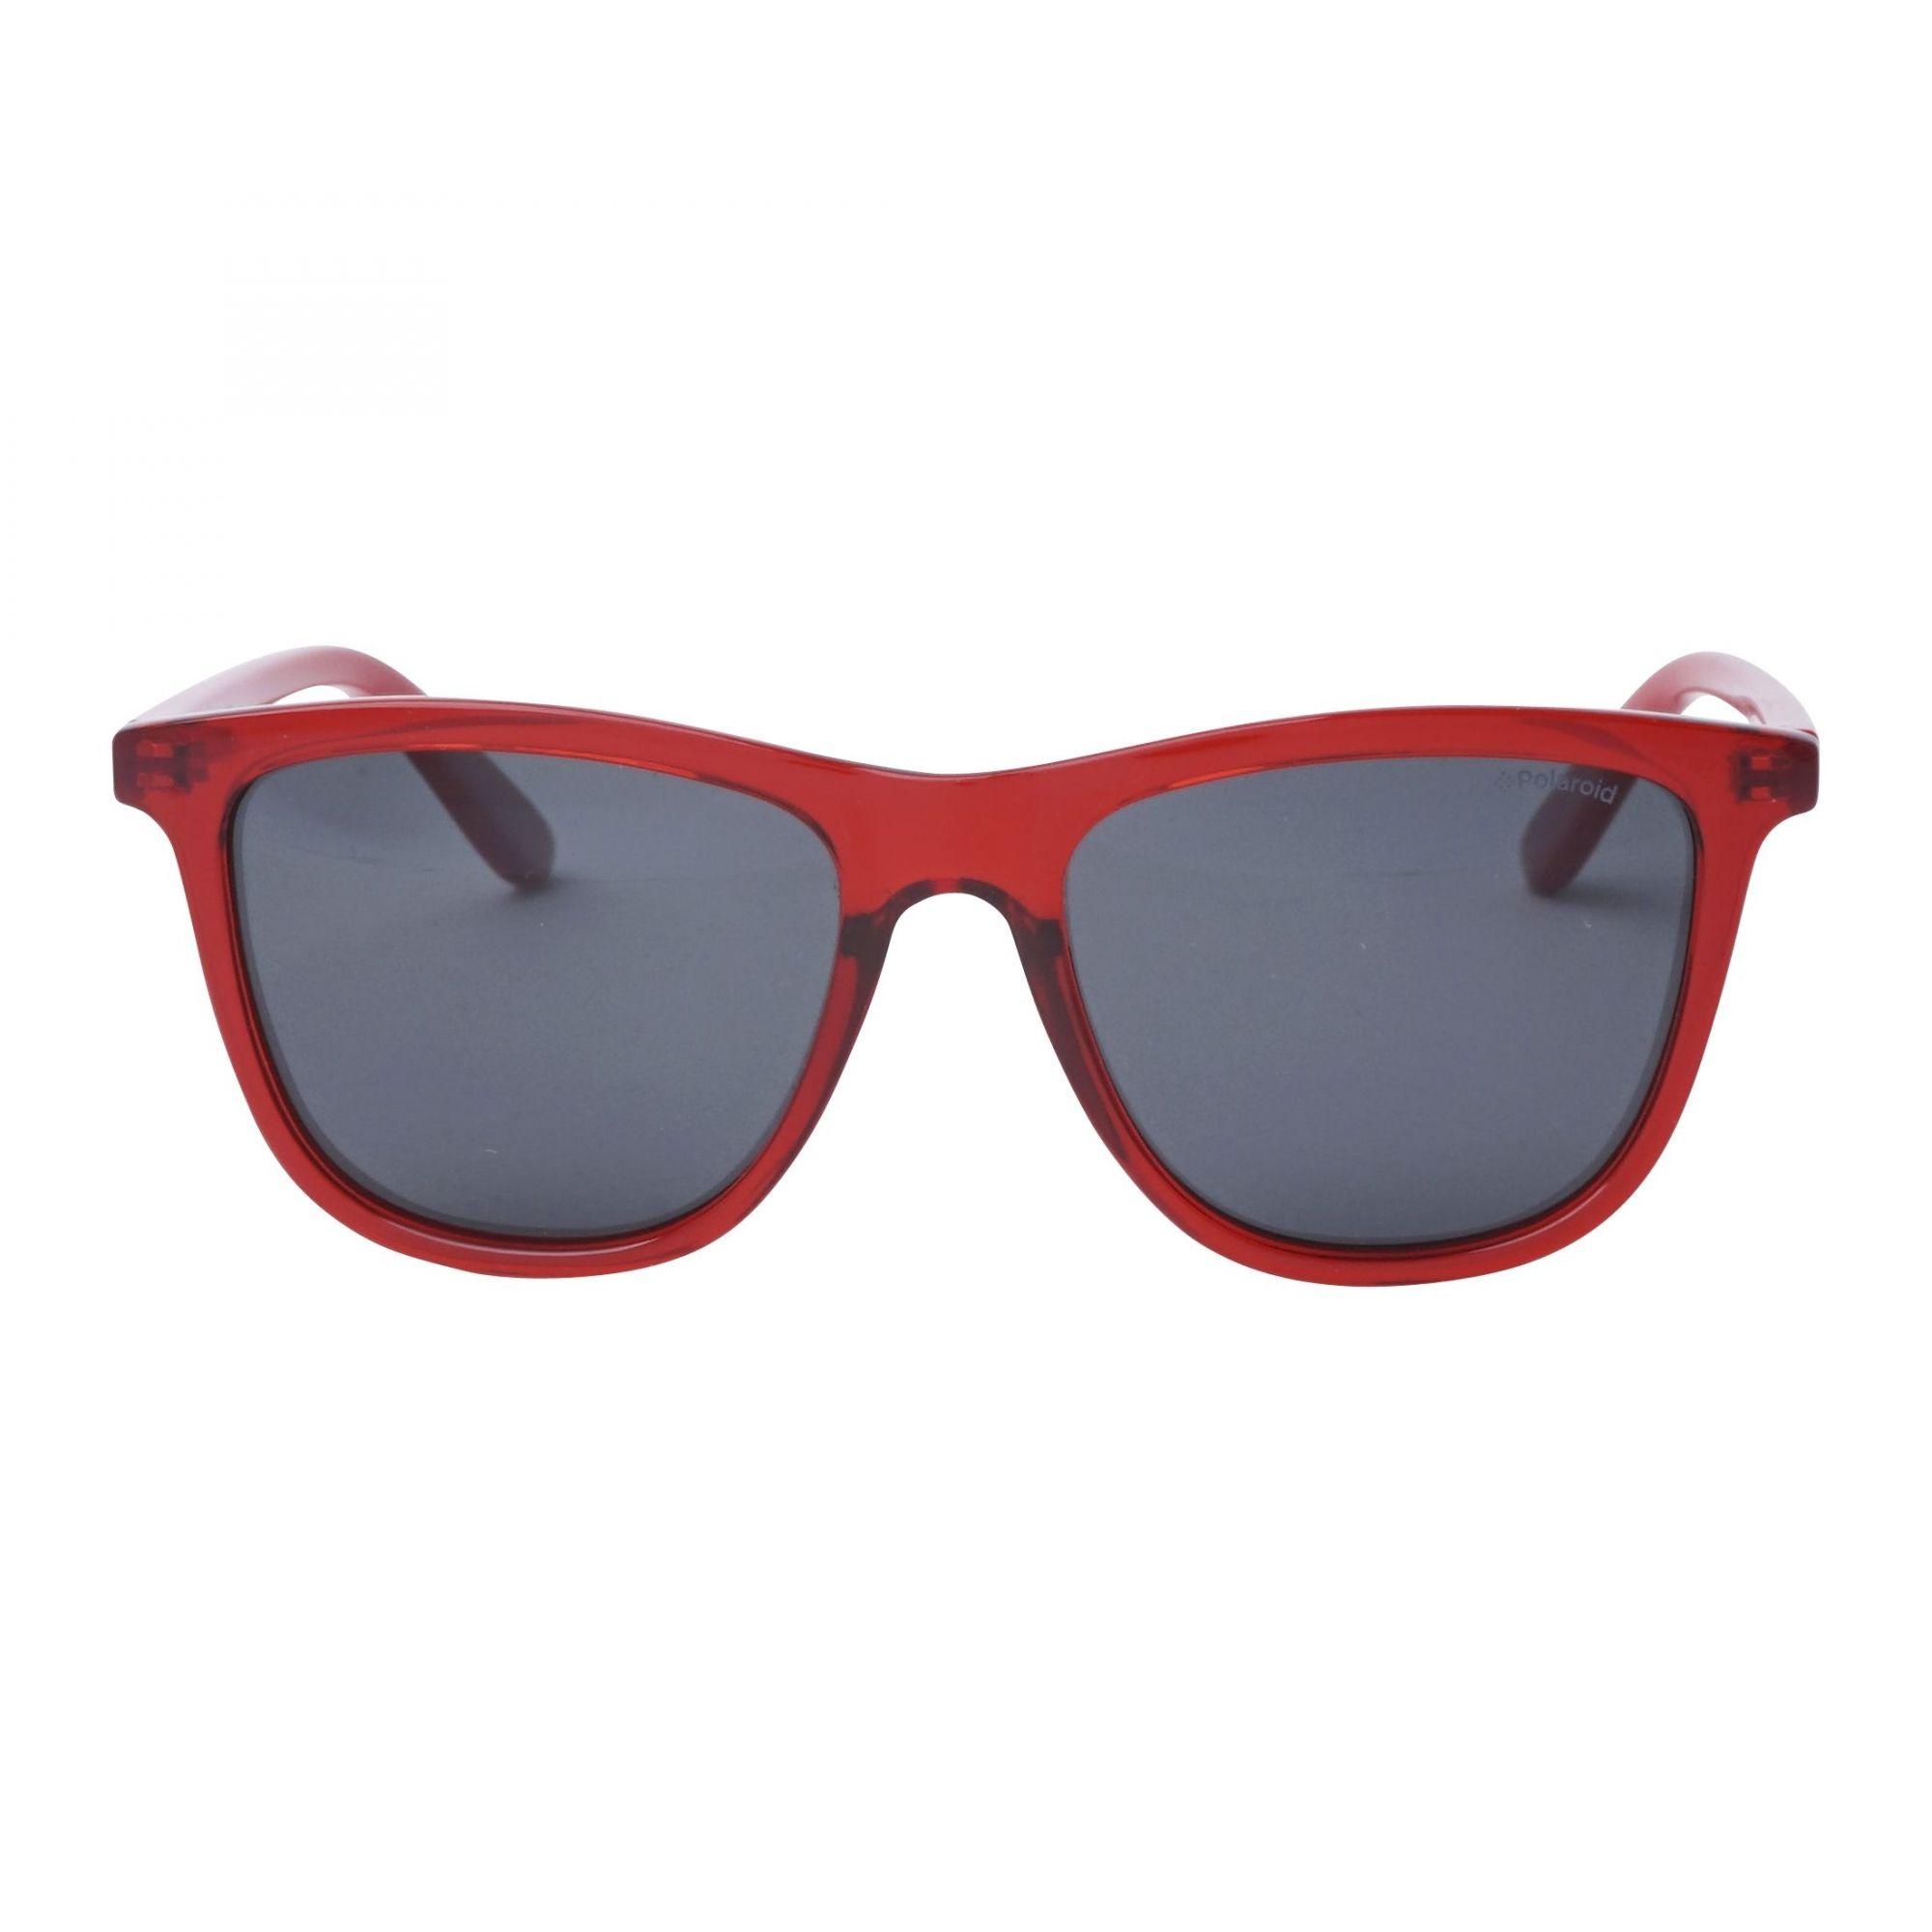 e8e16314b Óculos de Sol Polaroid Infanto-Juvenil Feminino PLD8027/S C9AM9 ...